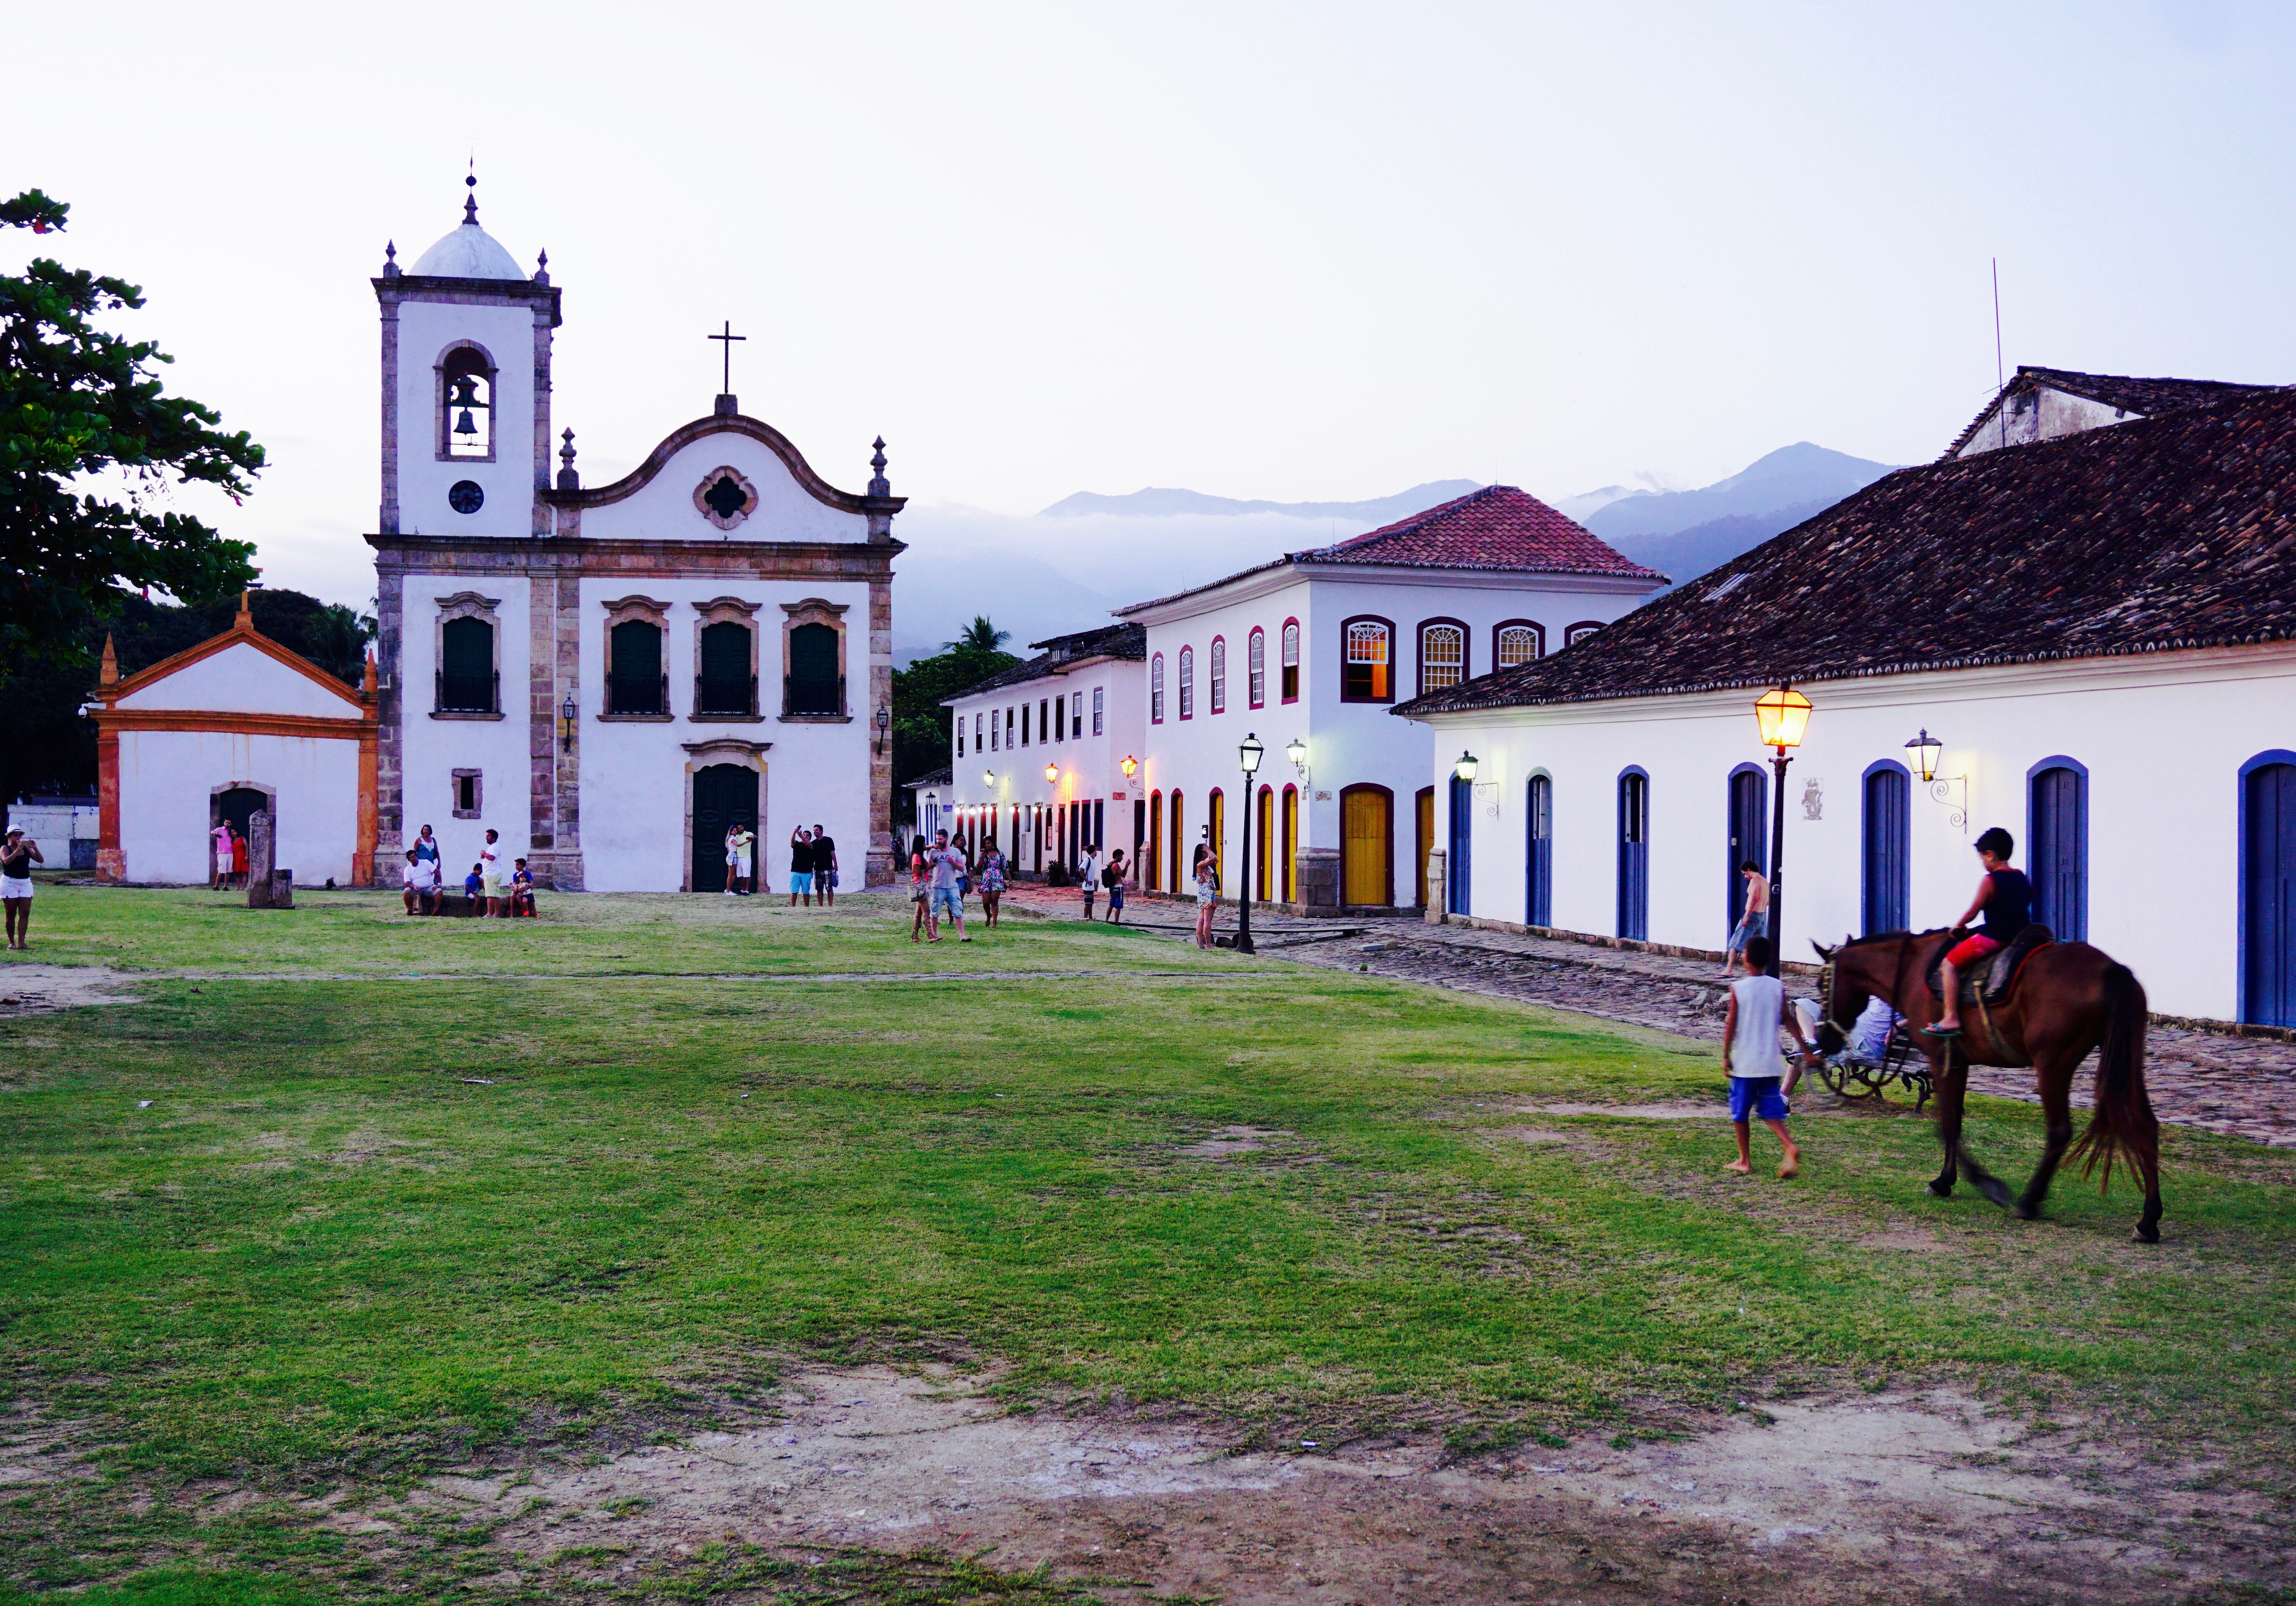 Church in Paraty Rio